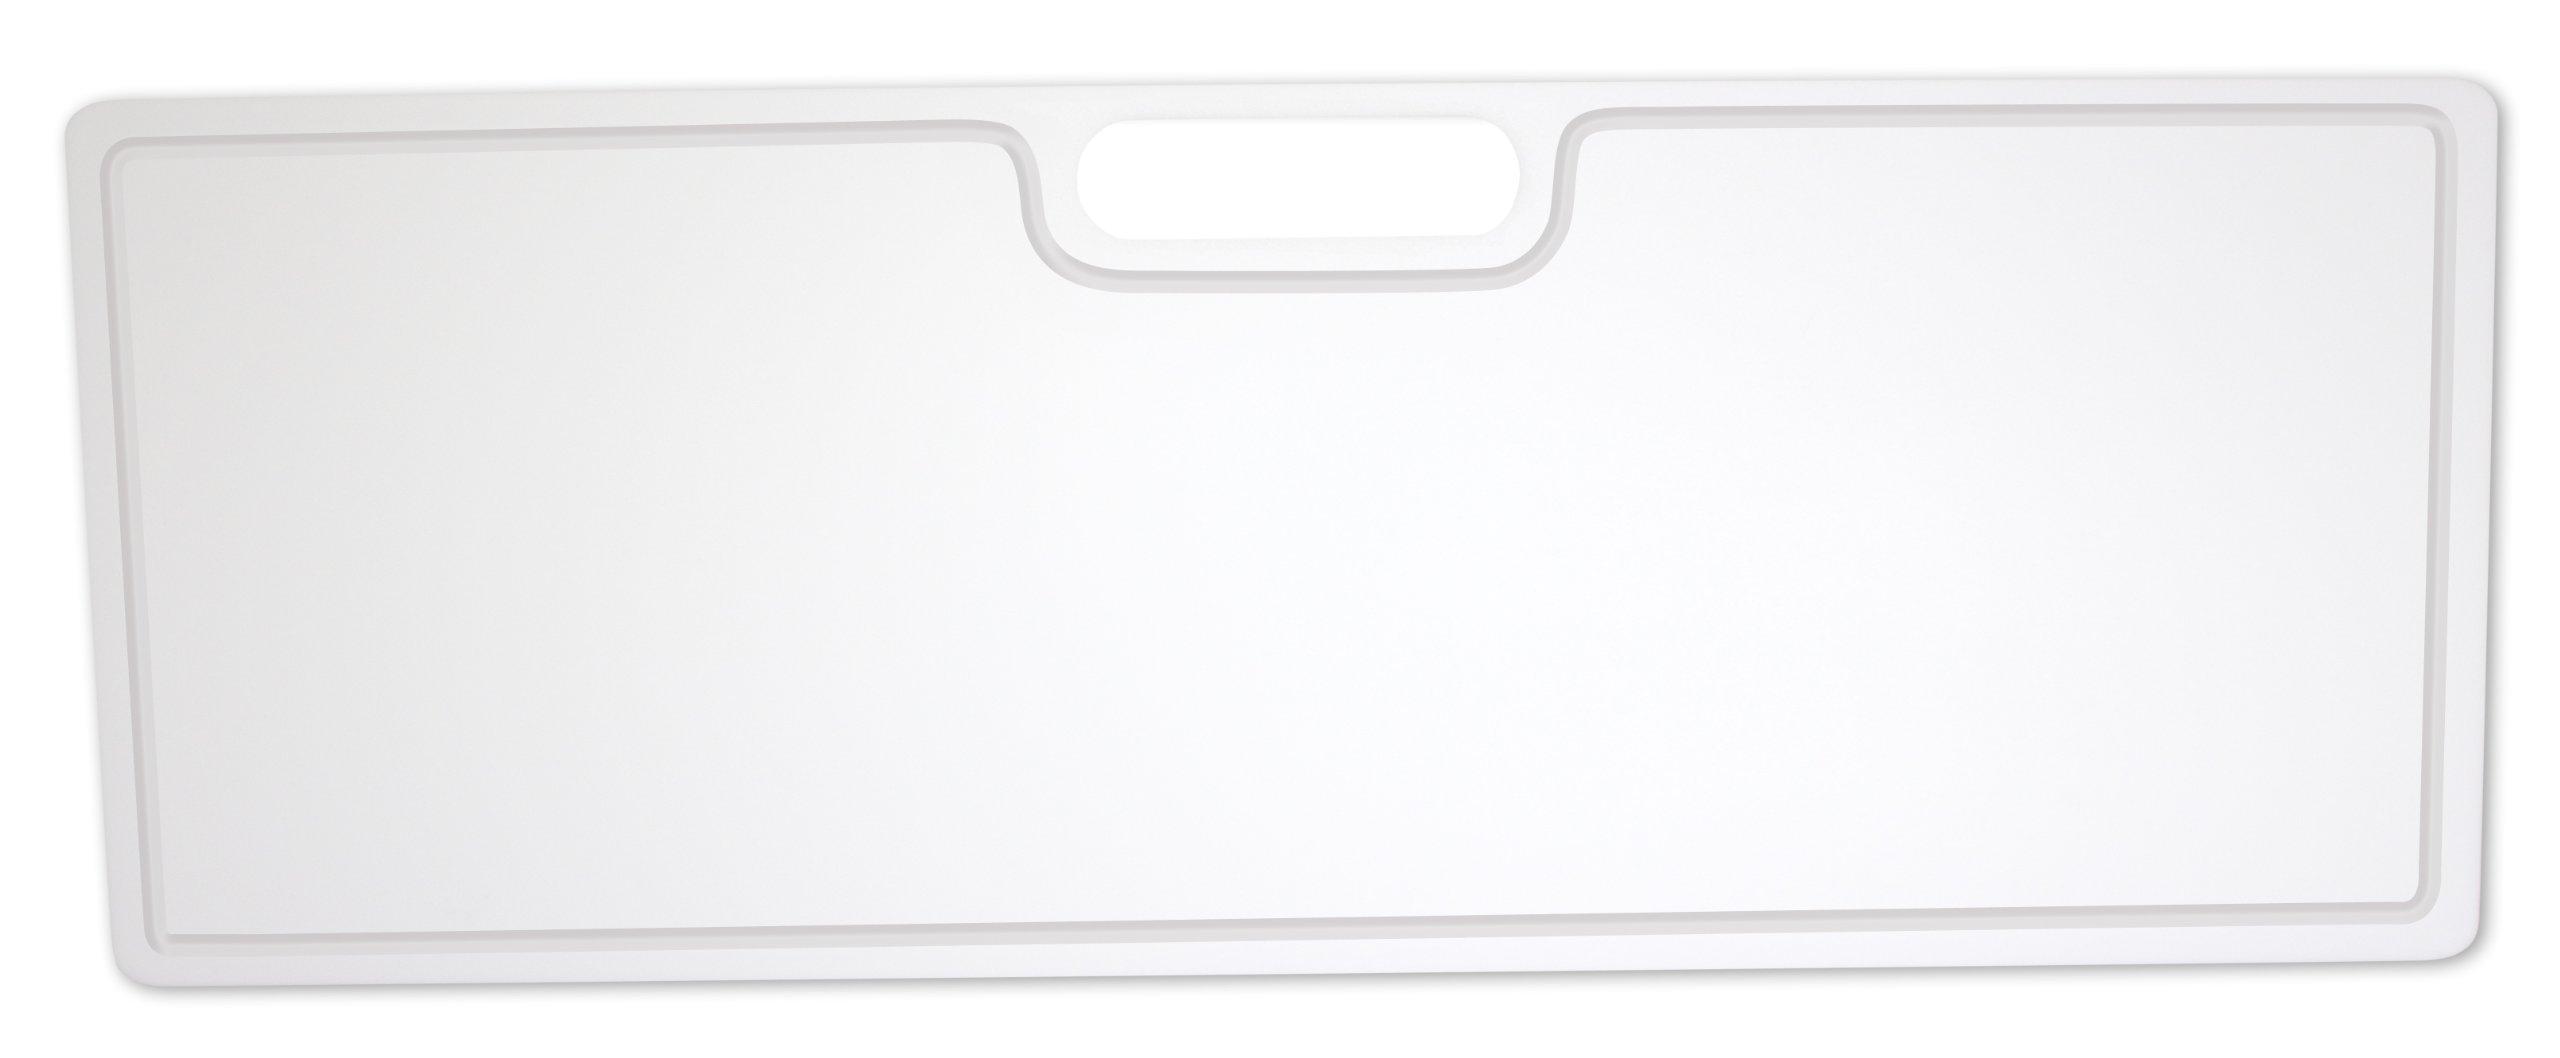 CHARD GPB-12 Game Processing Cutting Board, 12 x 32-Inch